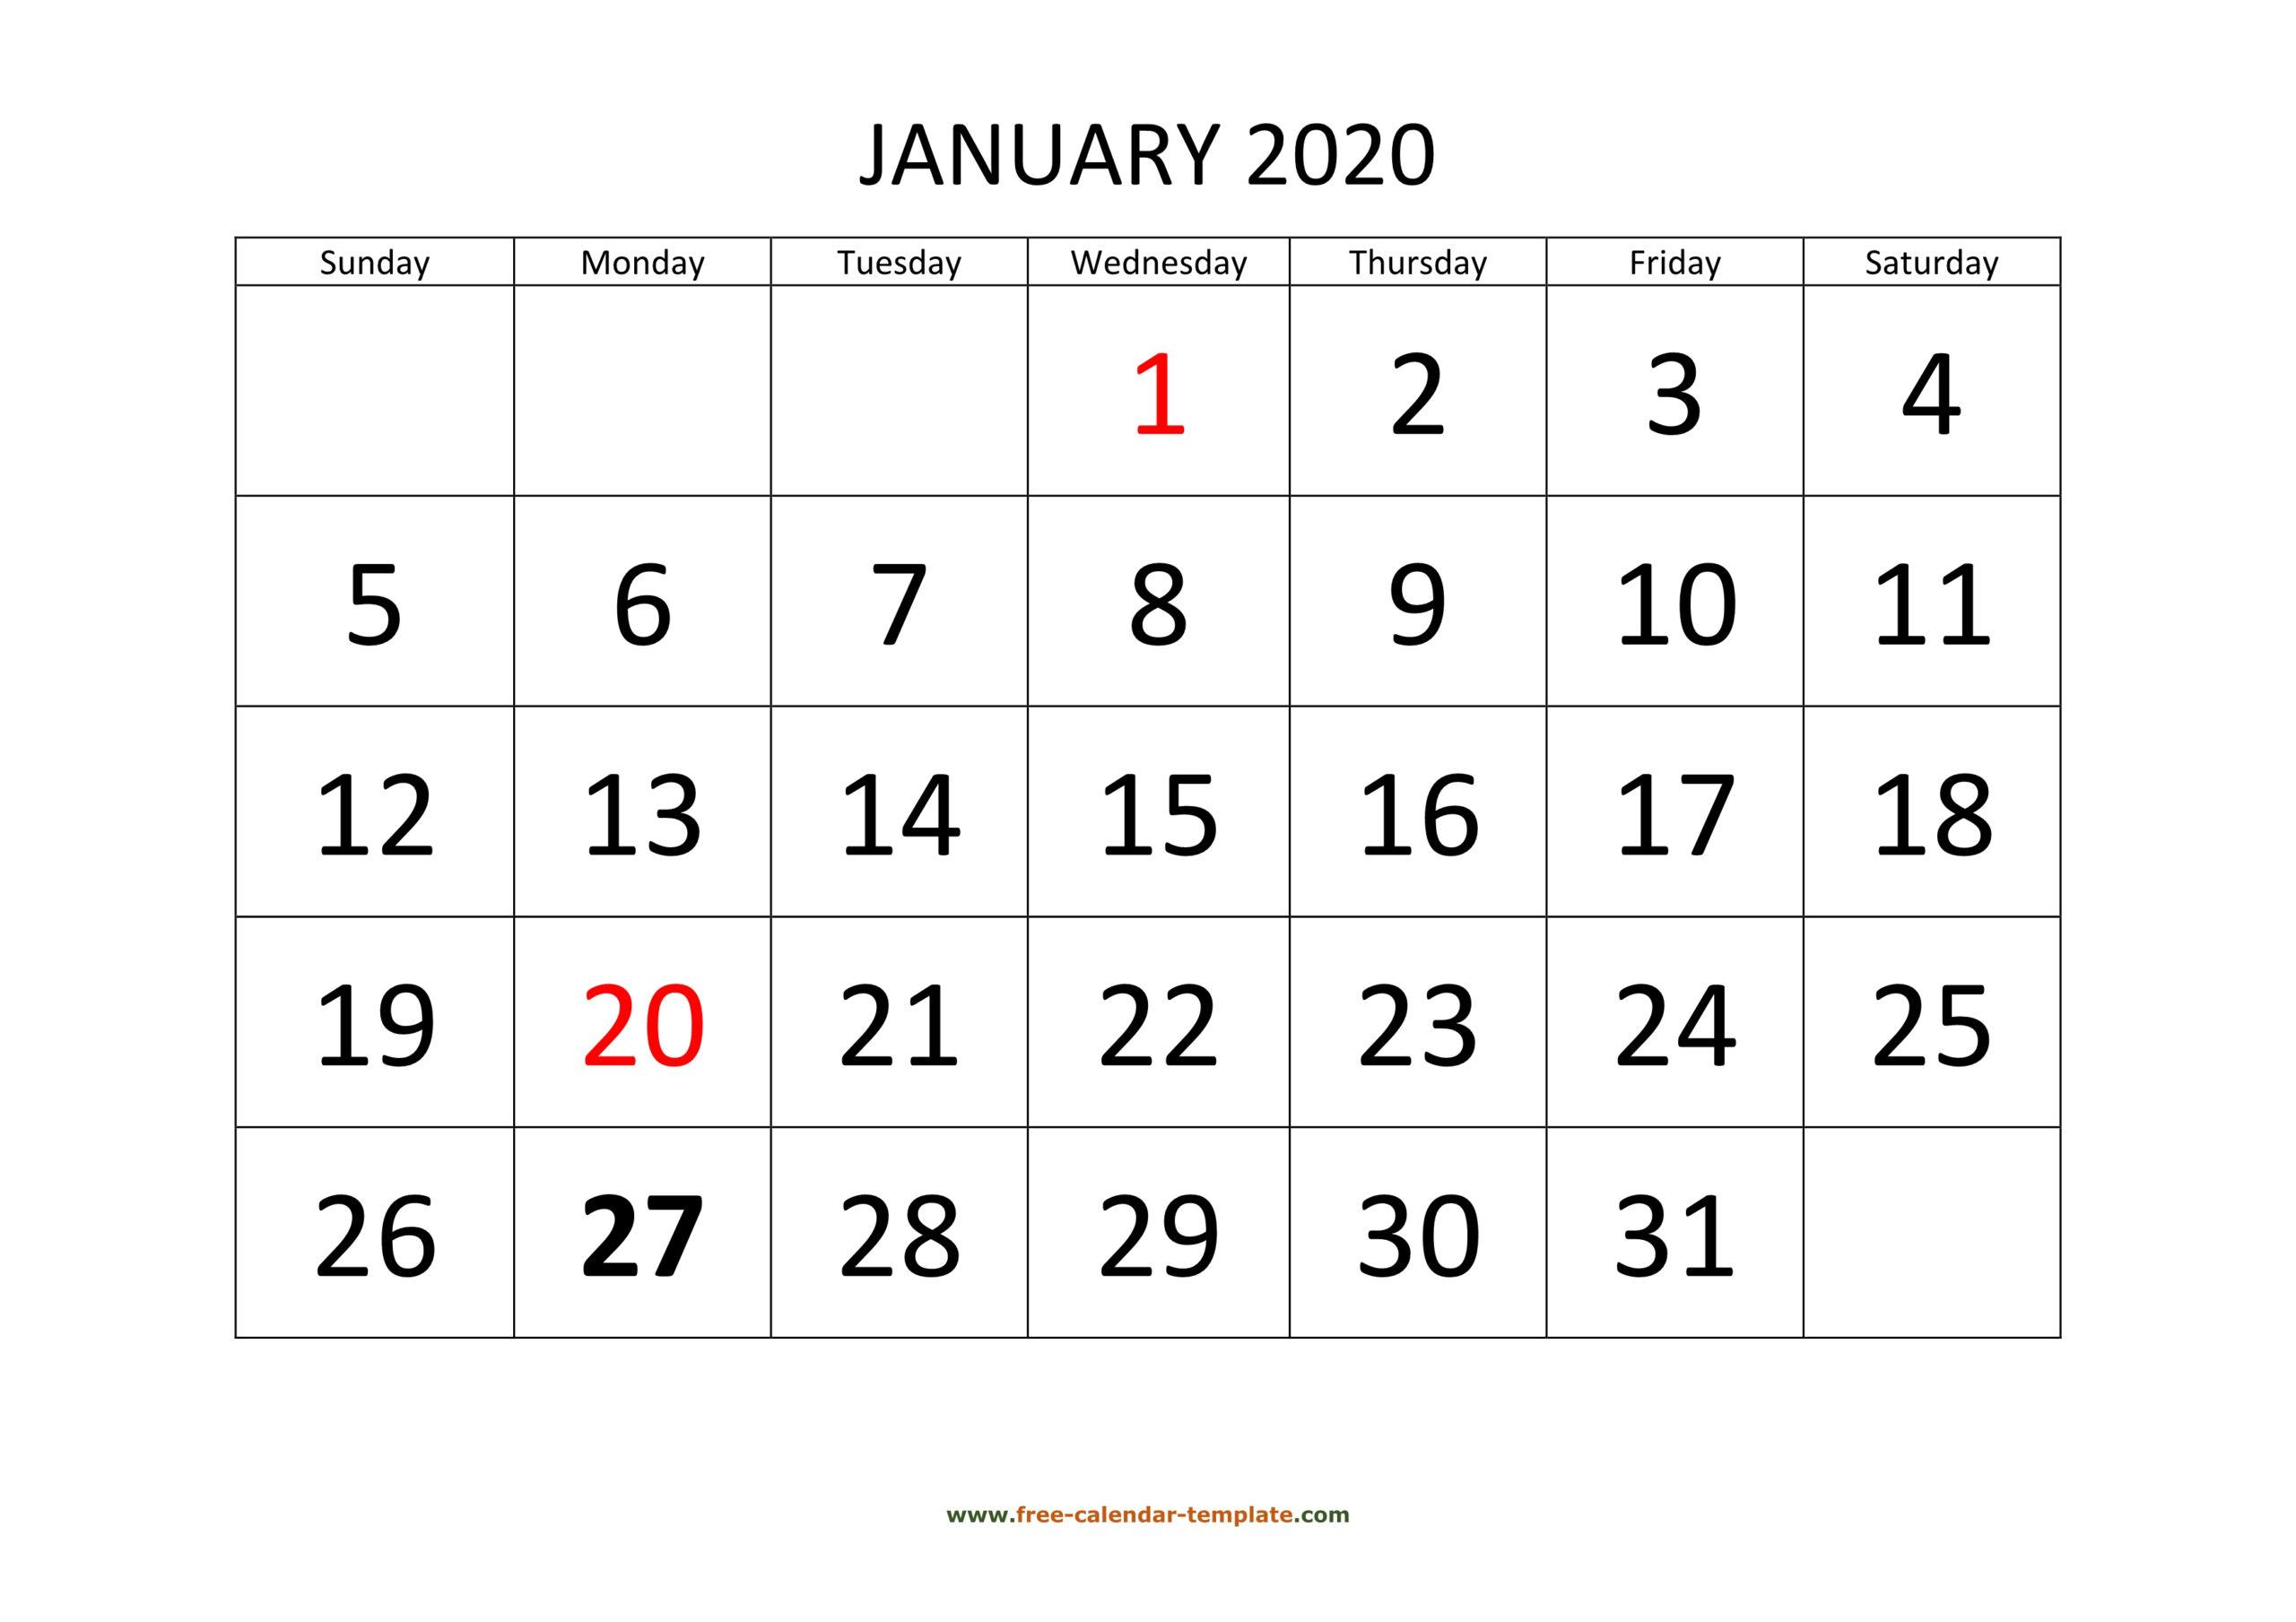 Printable Monthly Calendar 2020 | Free-Calendar-Template